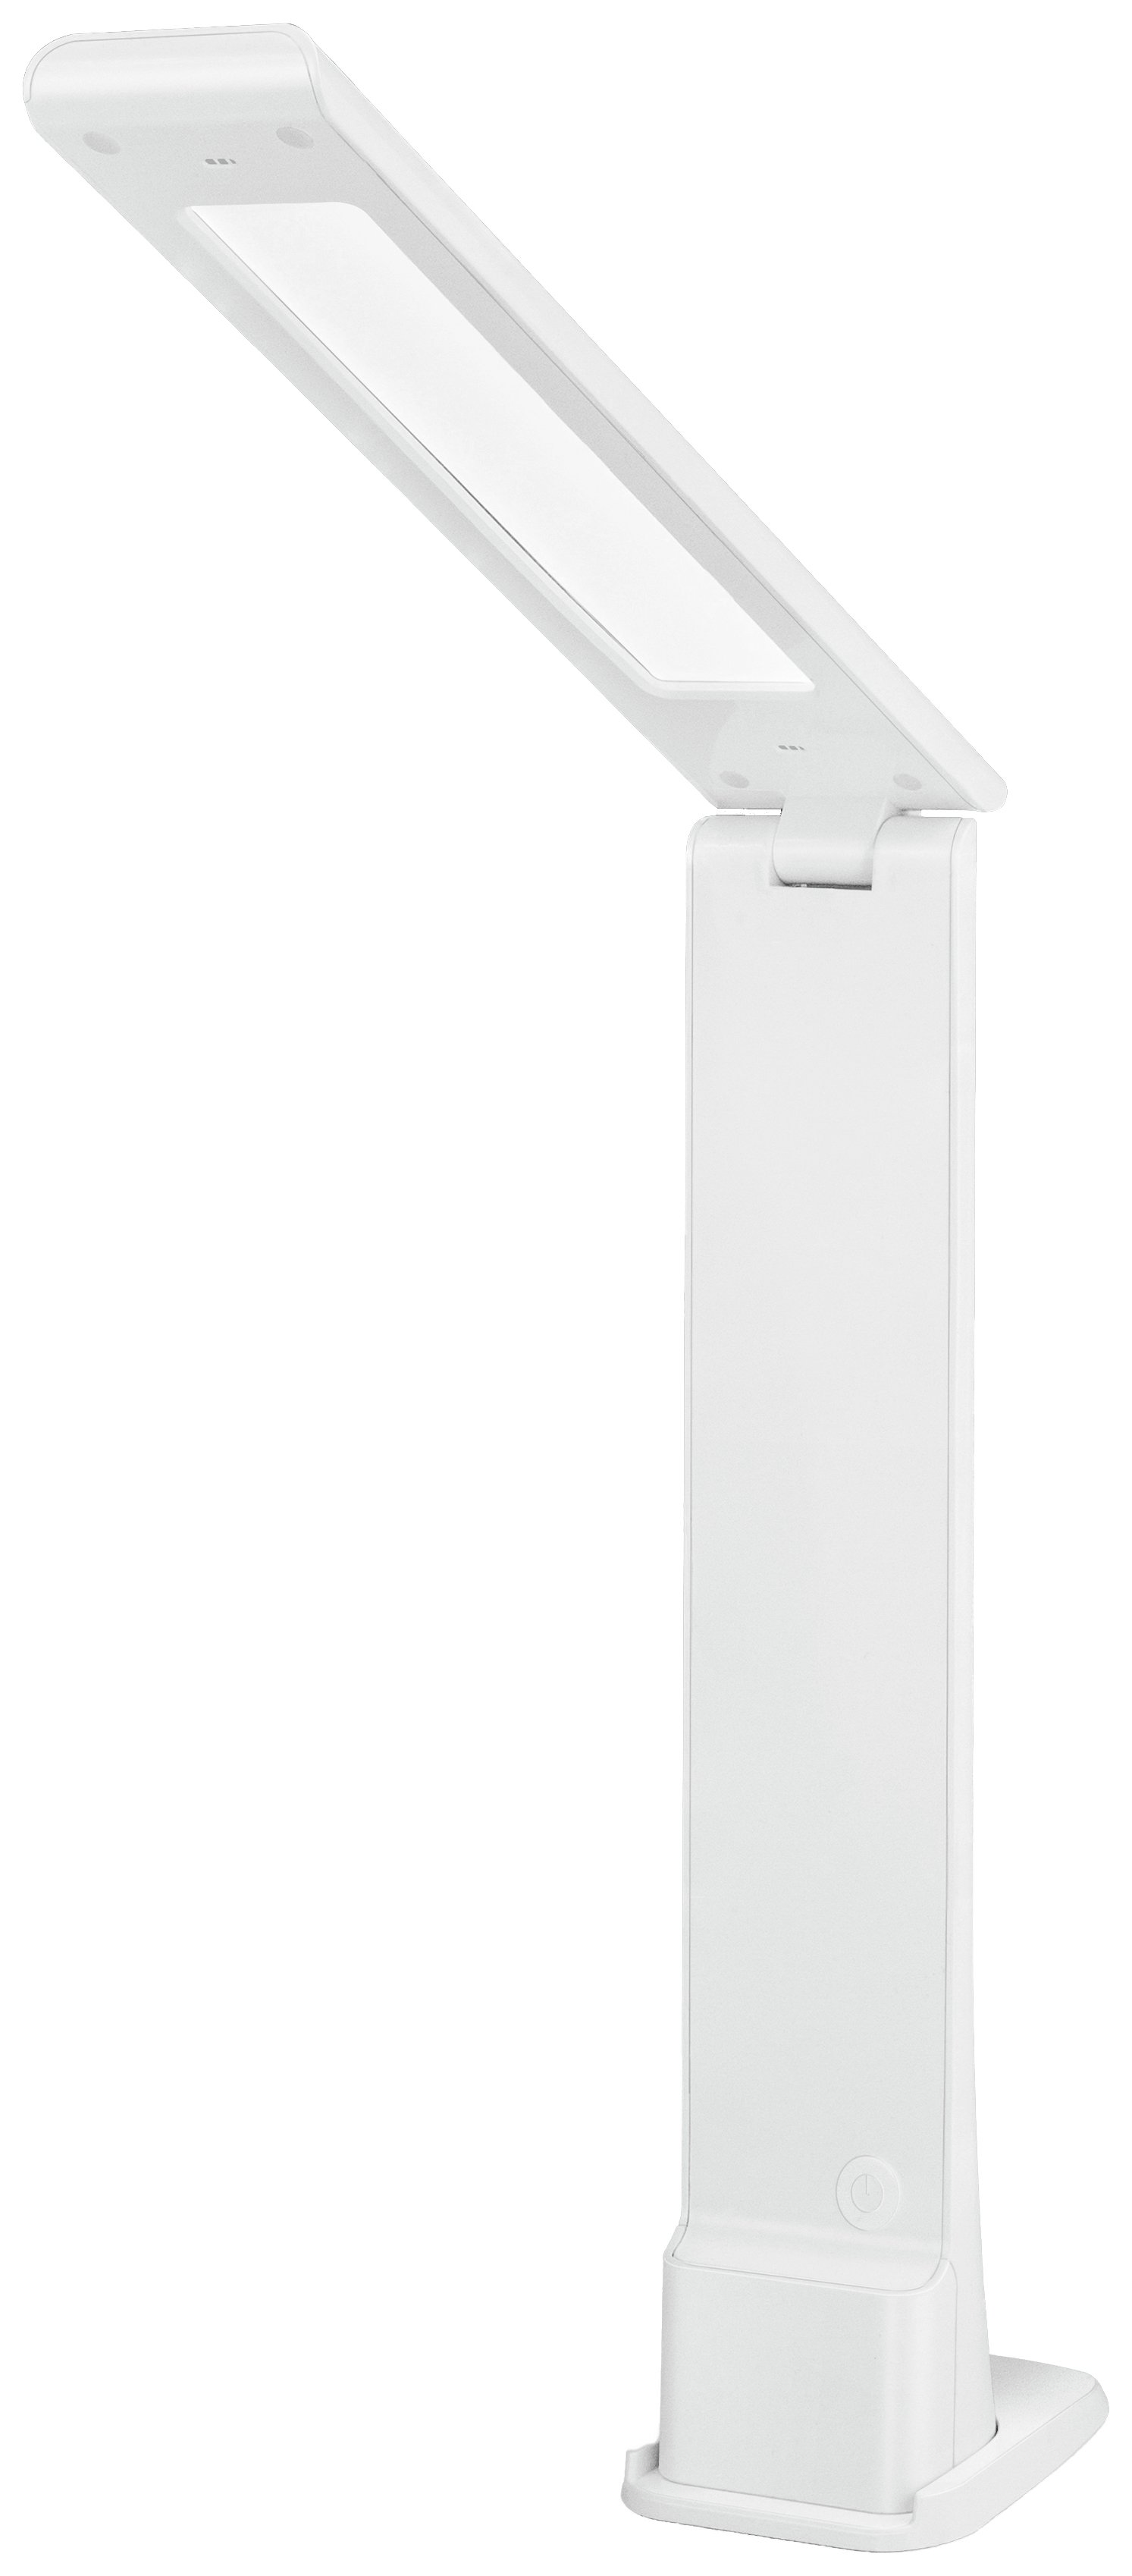 Lightcraft LED Cordless Folding Lamp - White